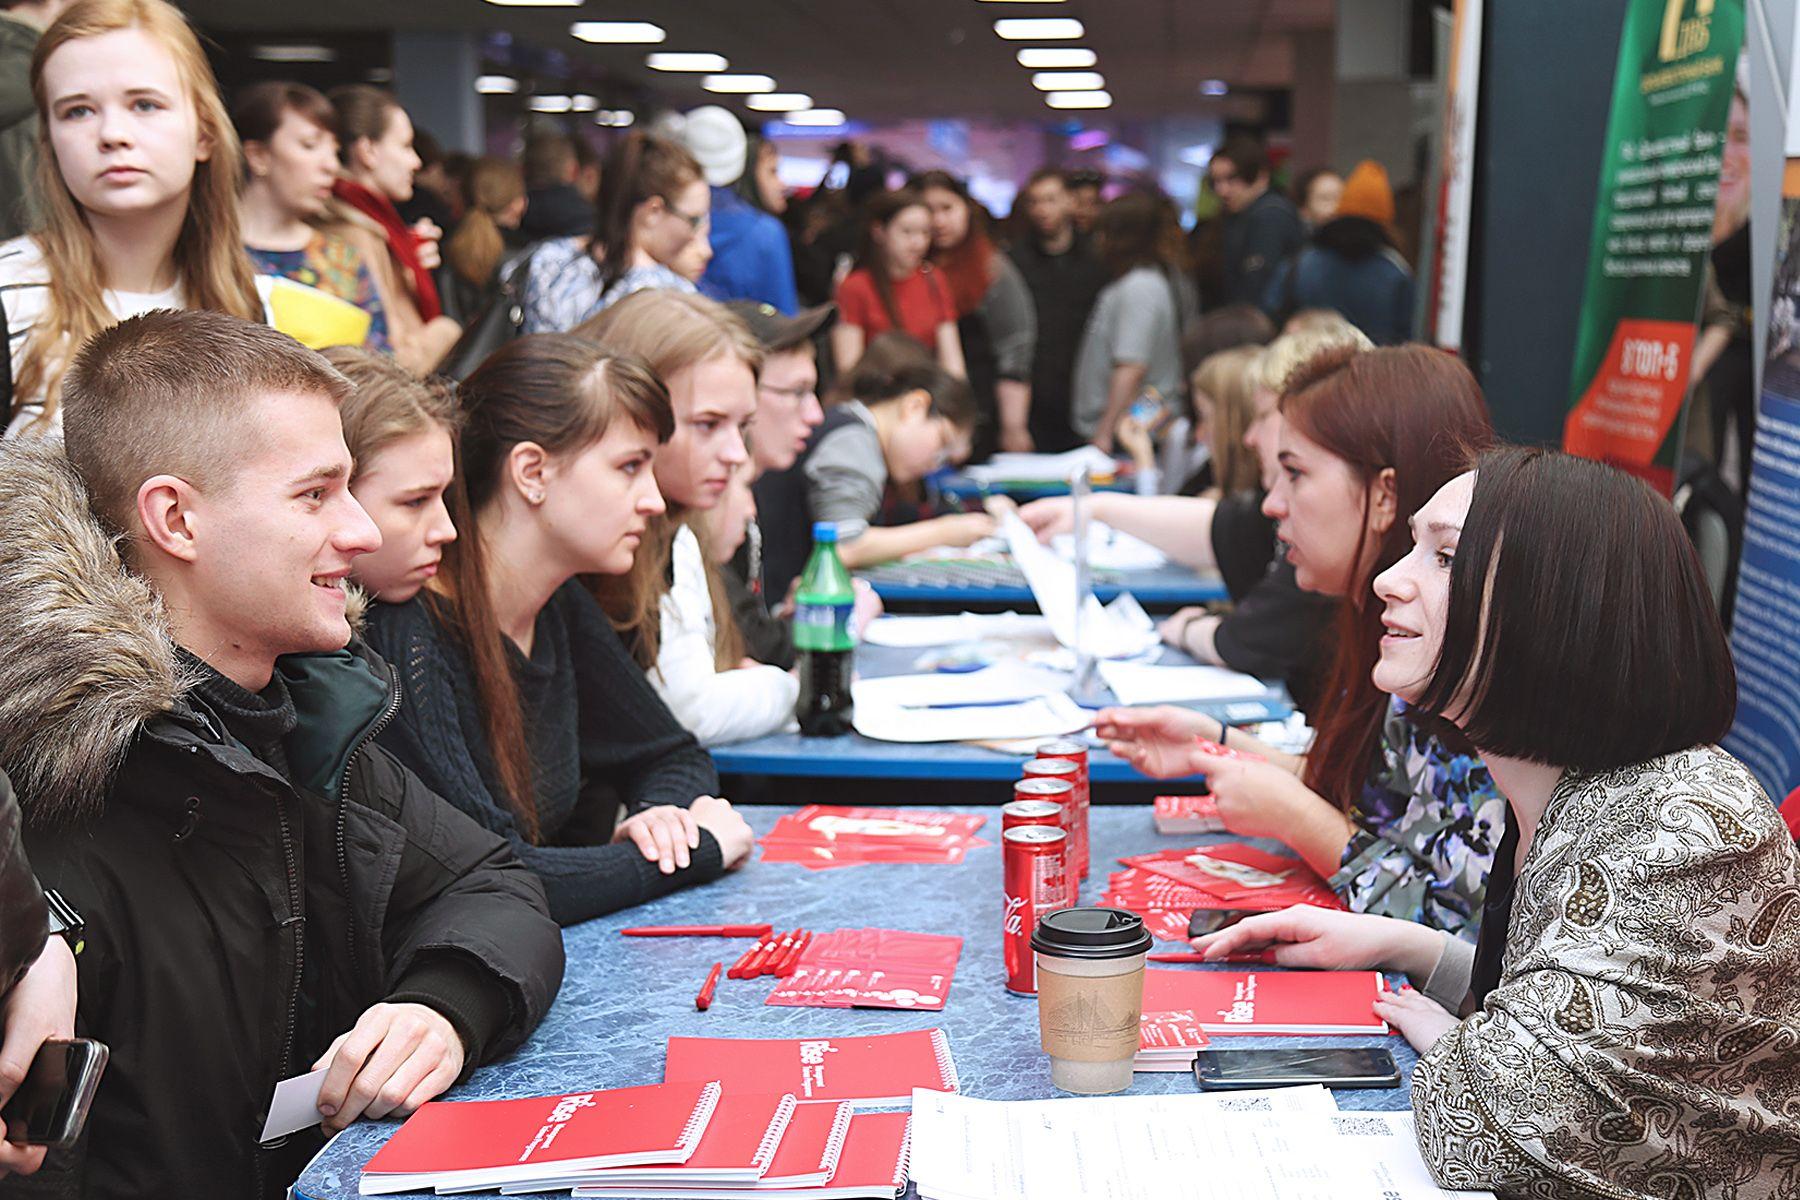 День карьеры онлайн: ярмарка вакансий ВГУЭС пройдет на платформе «Факультетус»